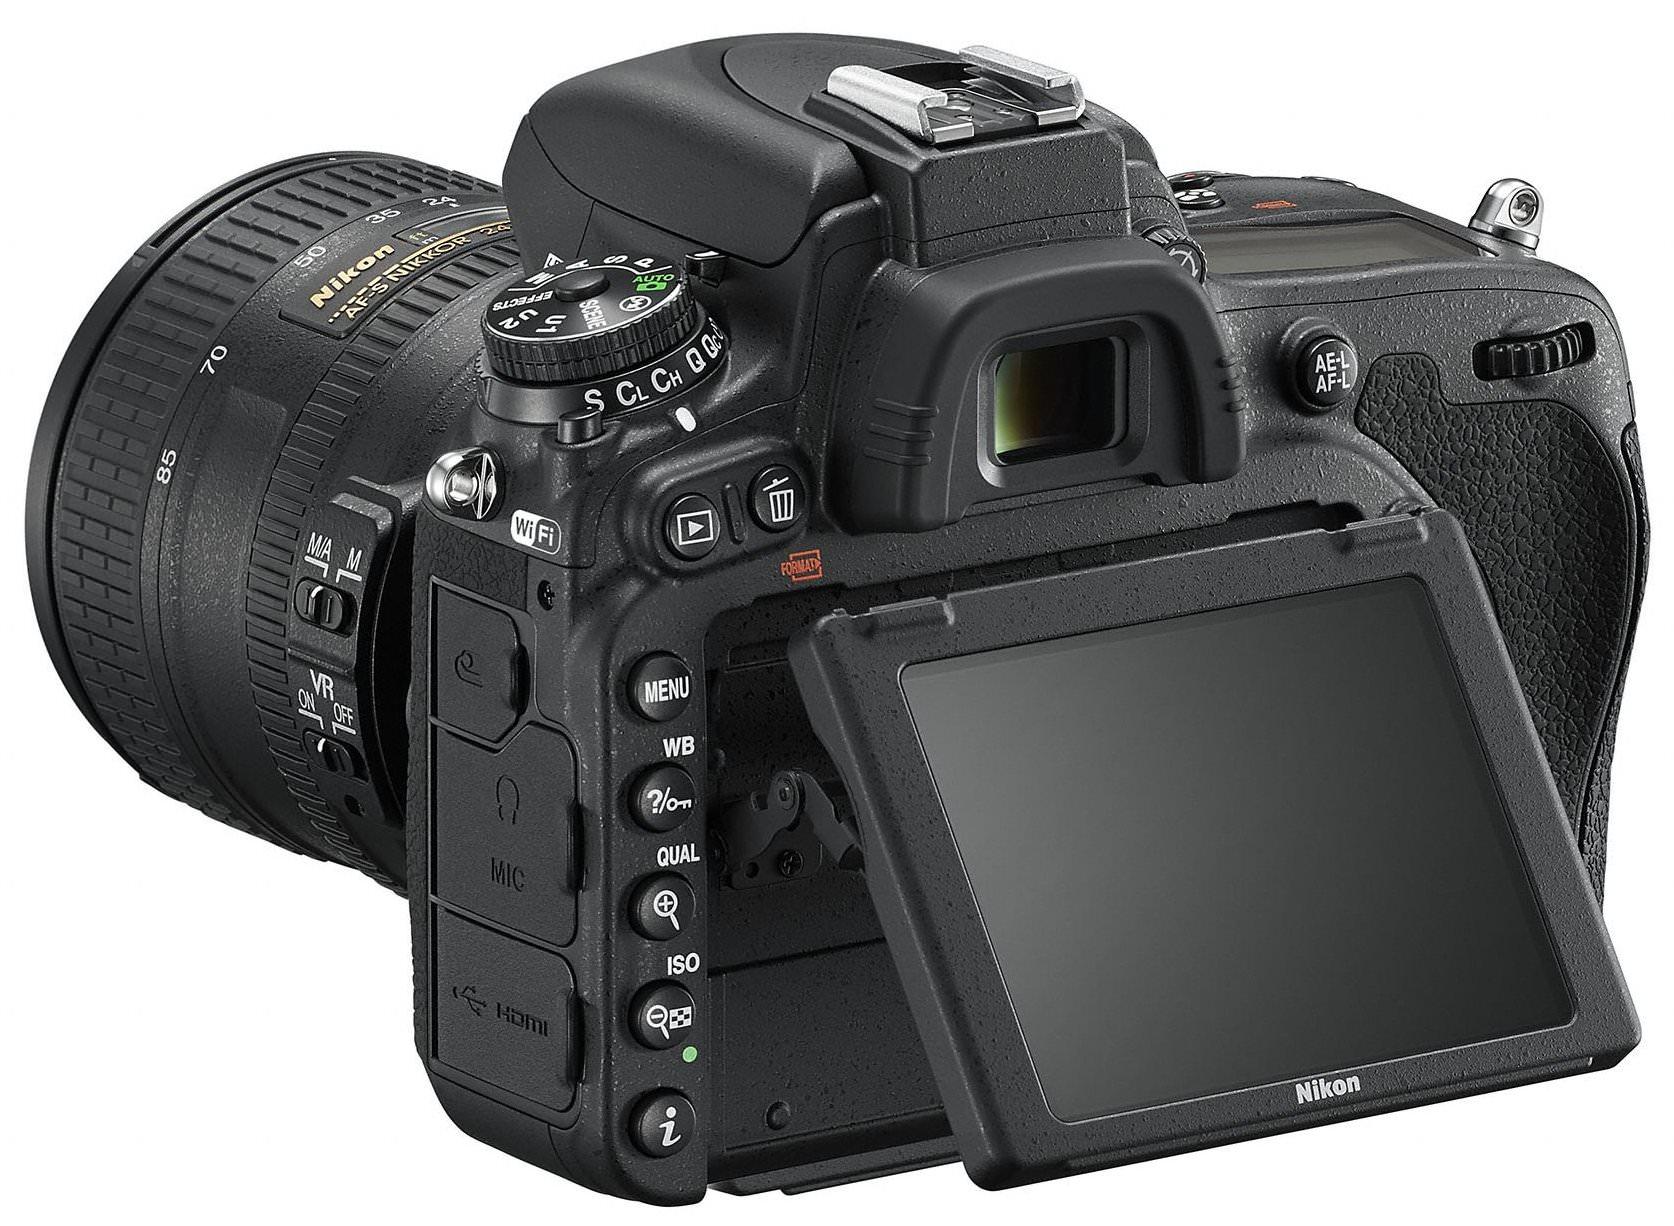 Wunderbar Full Frame Dslr Nikon Ideen - Benutzerdefinierte ...